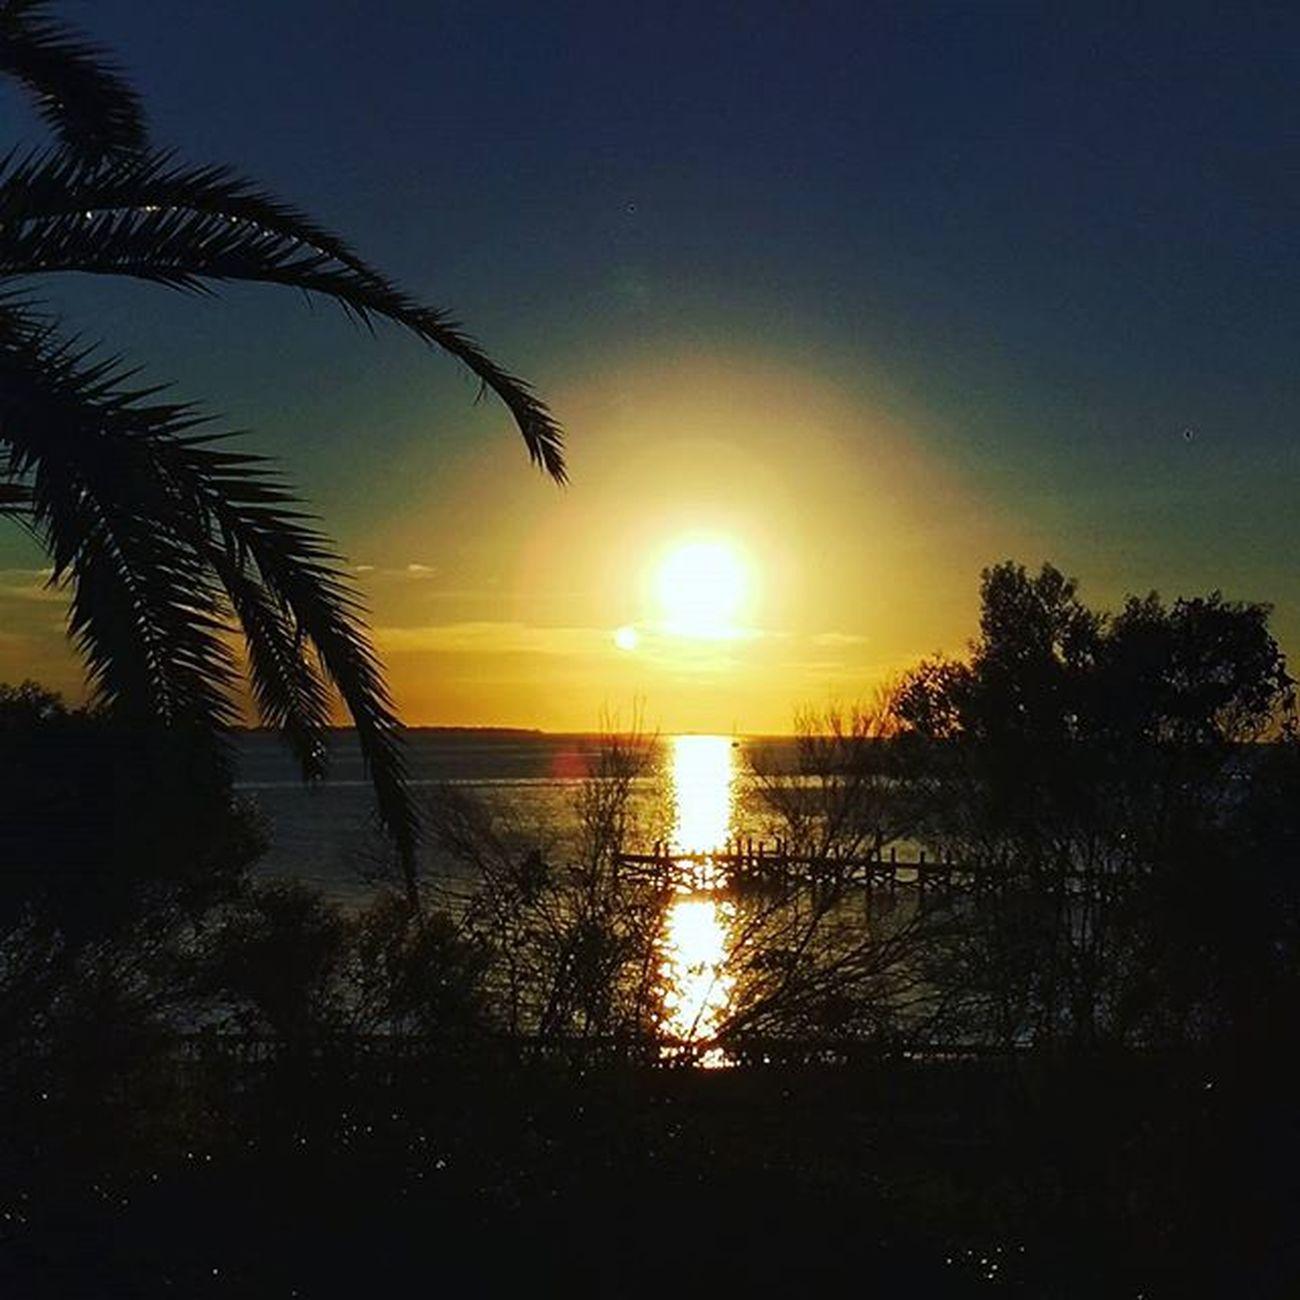 Sunset Trees Navarrebeach Navarre LoveFl Emeraldcoast Emeraldcoasting HTCOneM9 Htconelife Oneography 20 .7mp @htc @HTCUSA @HTC_UK @HTCelevate @HTCMEA @HTC_IN @HTCIreland @HTCCanada @HTCMalaysia @htcsouthasia @htcfrance TeamHTC @sharealittlesunshine @pureflorida Beachlife Reflection